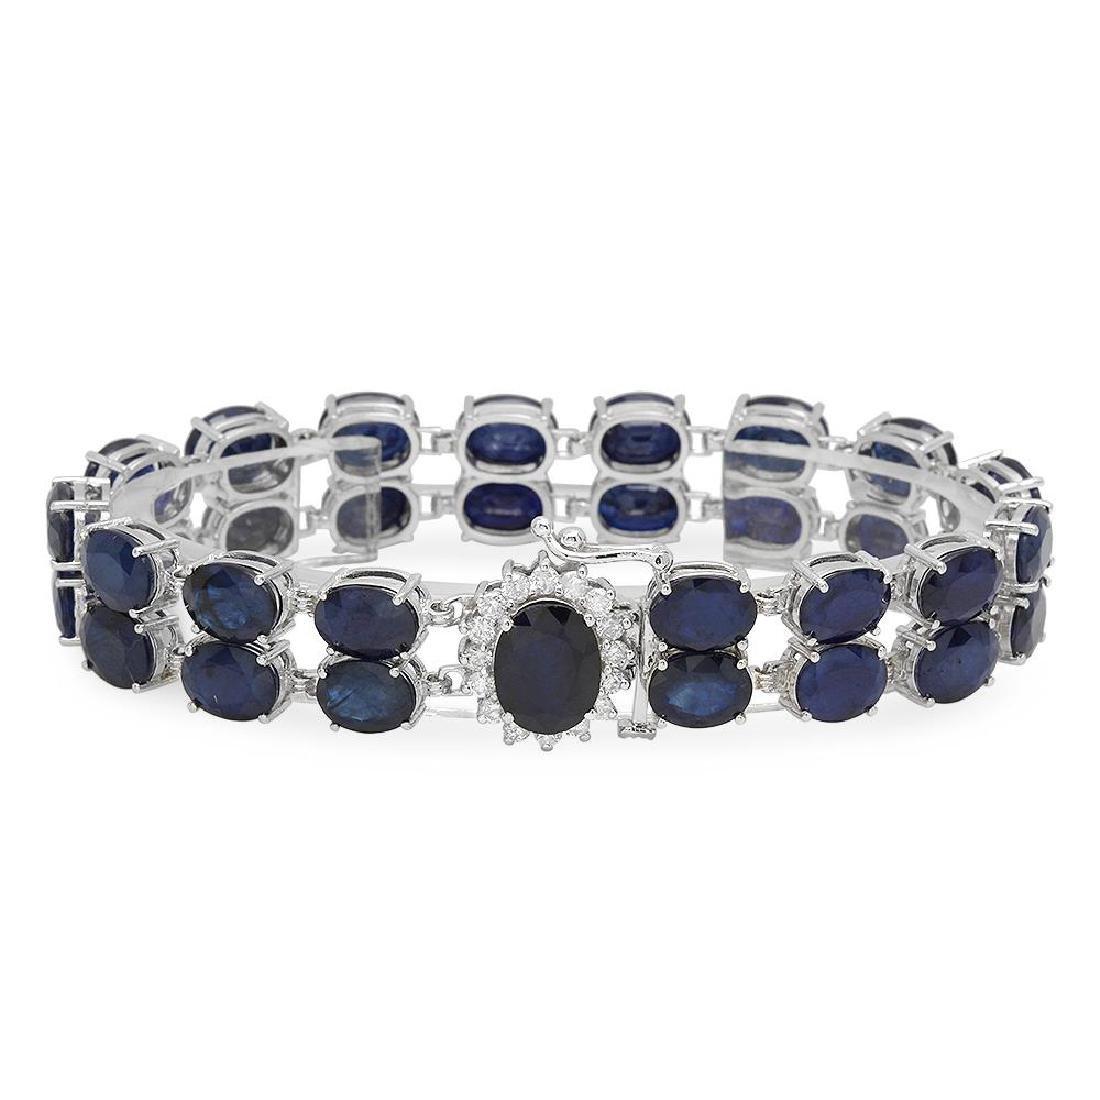 14K Gold 52.06ct Sapphire 0.63ct Diamond Bracelet